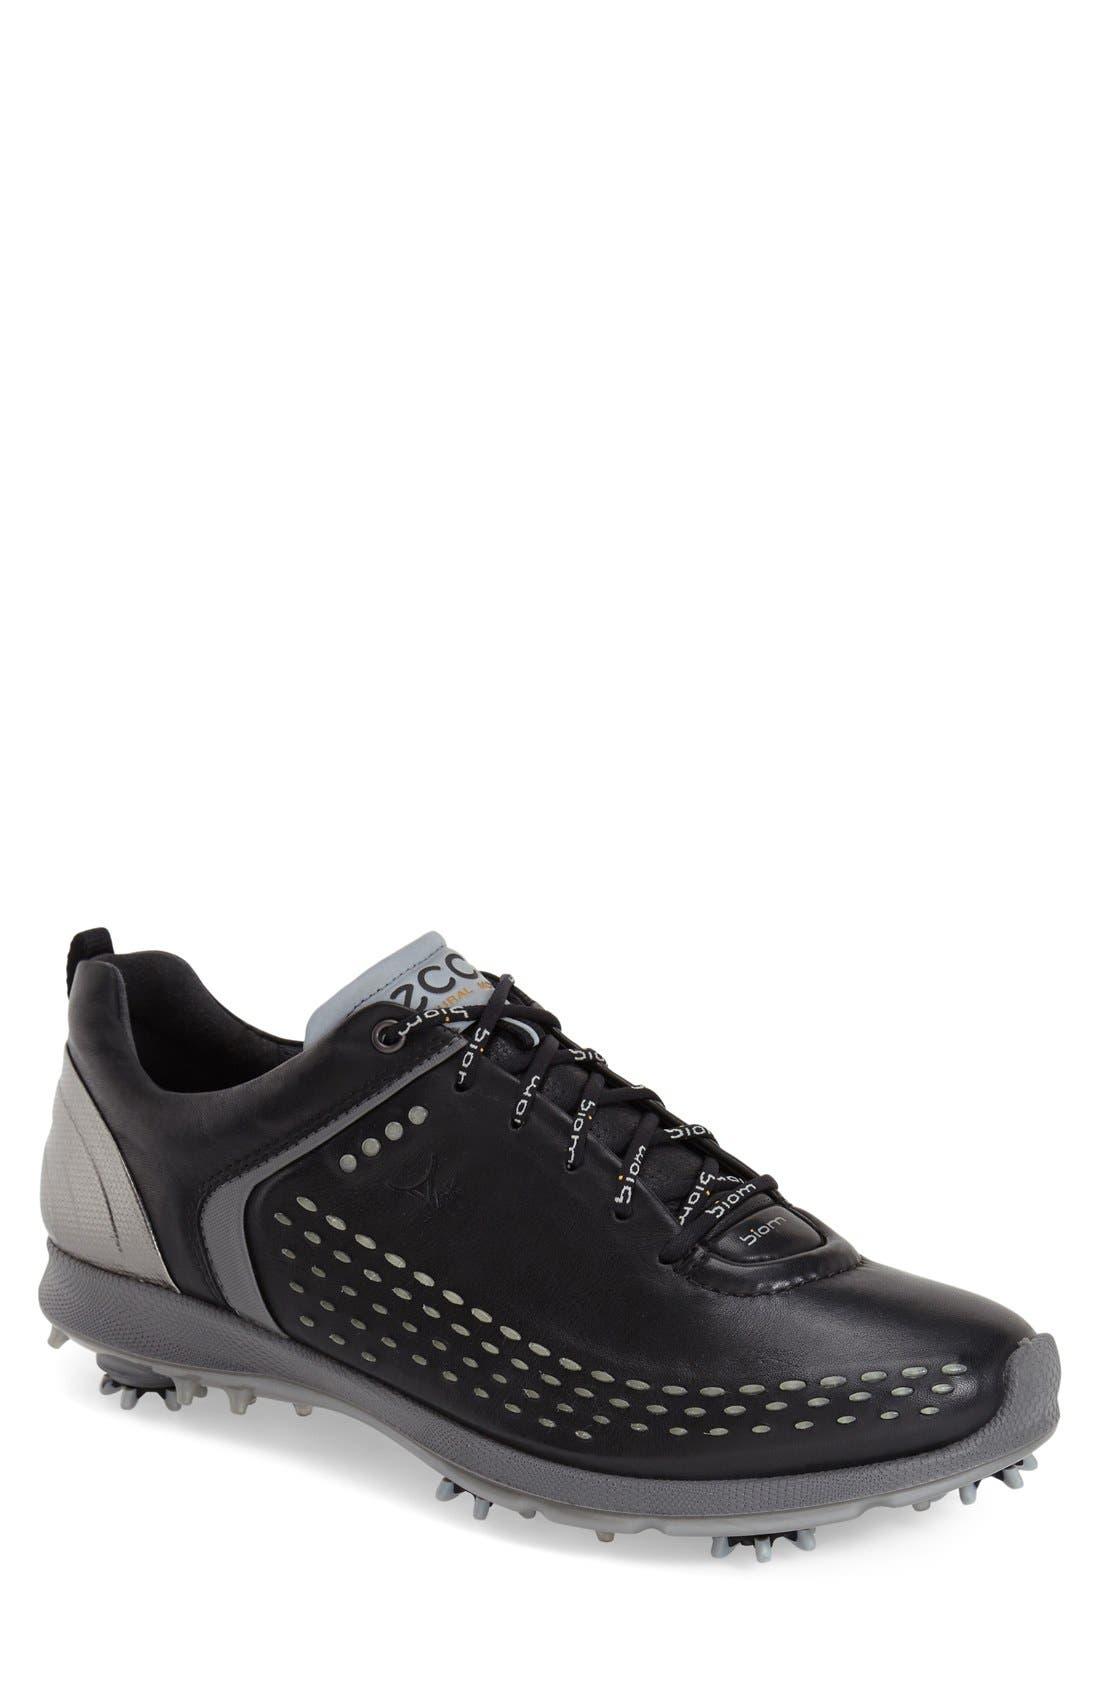 ecco waterproof golf shoes